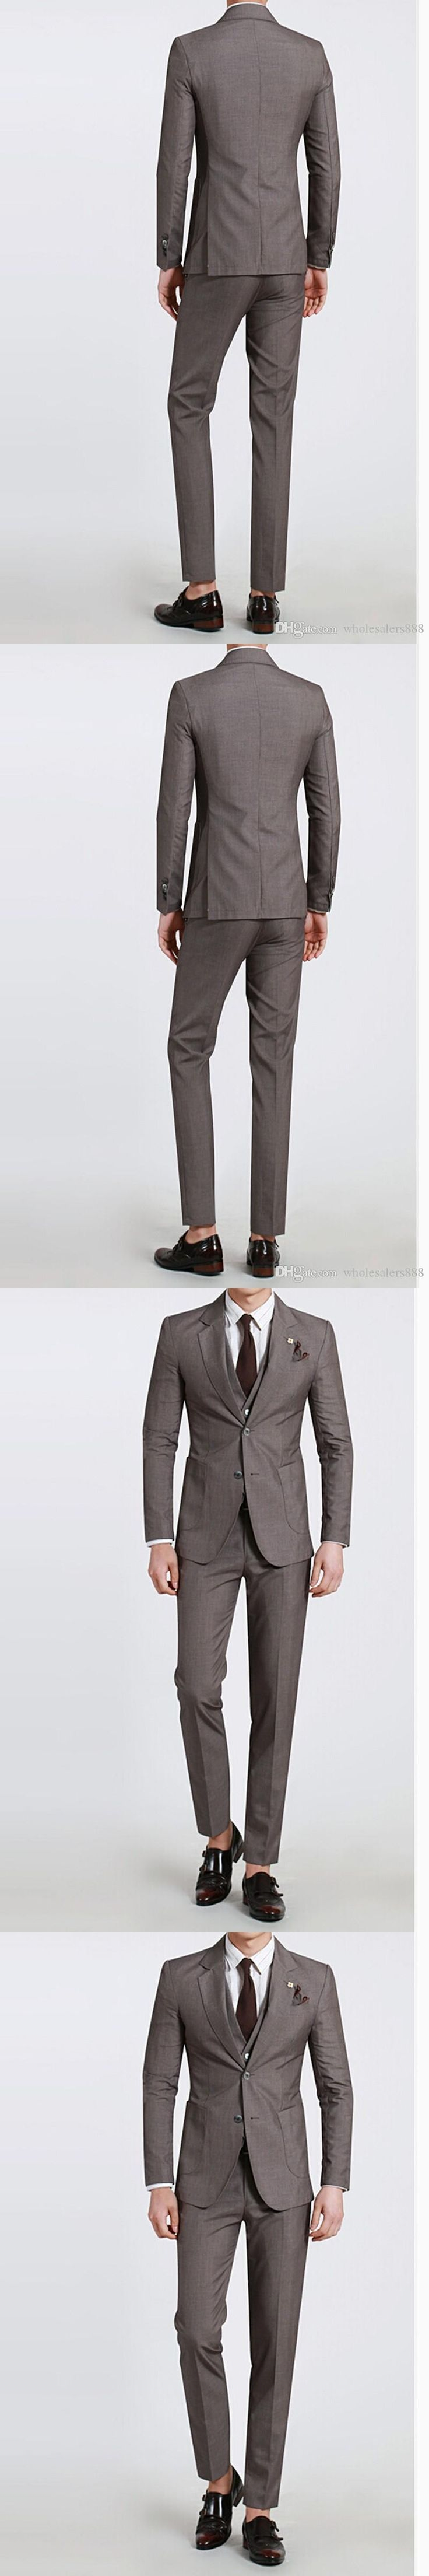 New Arrival Groom Tuxedos Slim Fit Groomsmen Notch Lapel Best Man Suit/Bridegroom/Wedding/Prom Suits (Jacket+Pants+Tie+Vest)